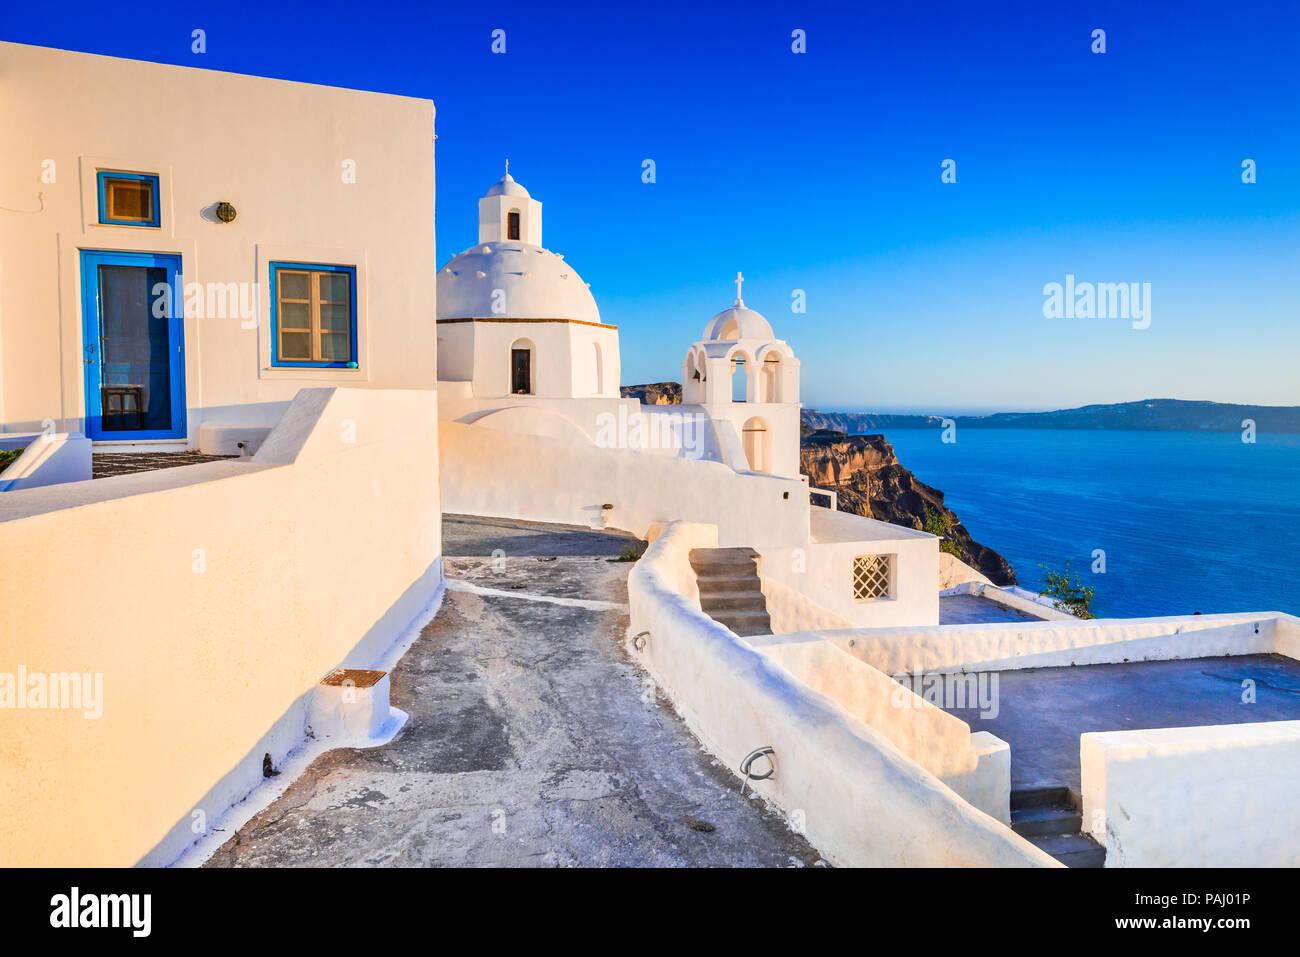 Santorini, Greece. Fira, with old greek church and caldera at Aegean Sea, Thira. - Stock Image